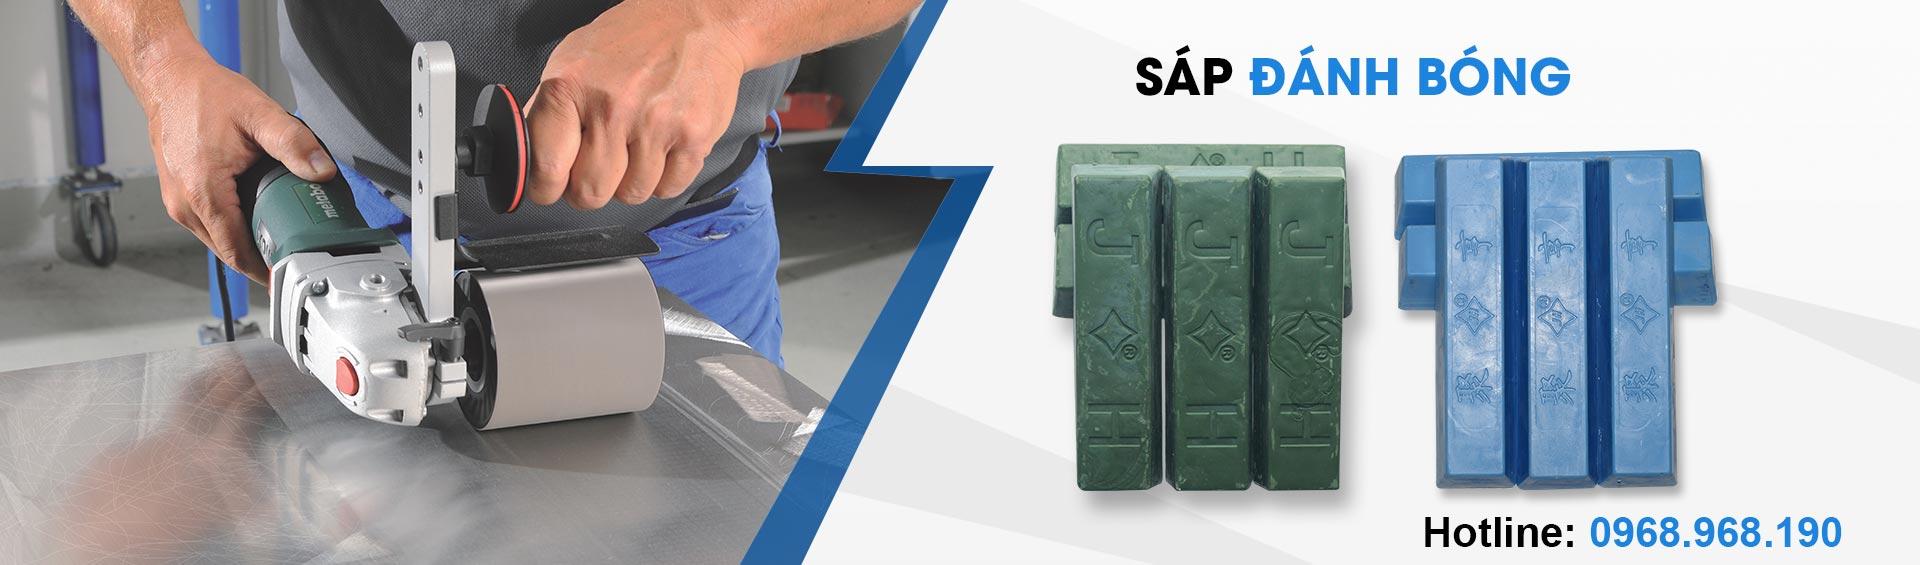 BANNER-SAP-DANH-BONG1